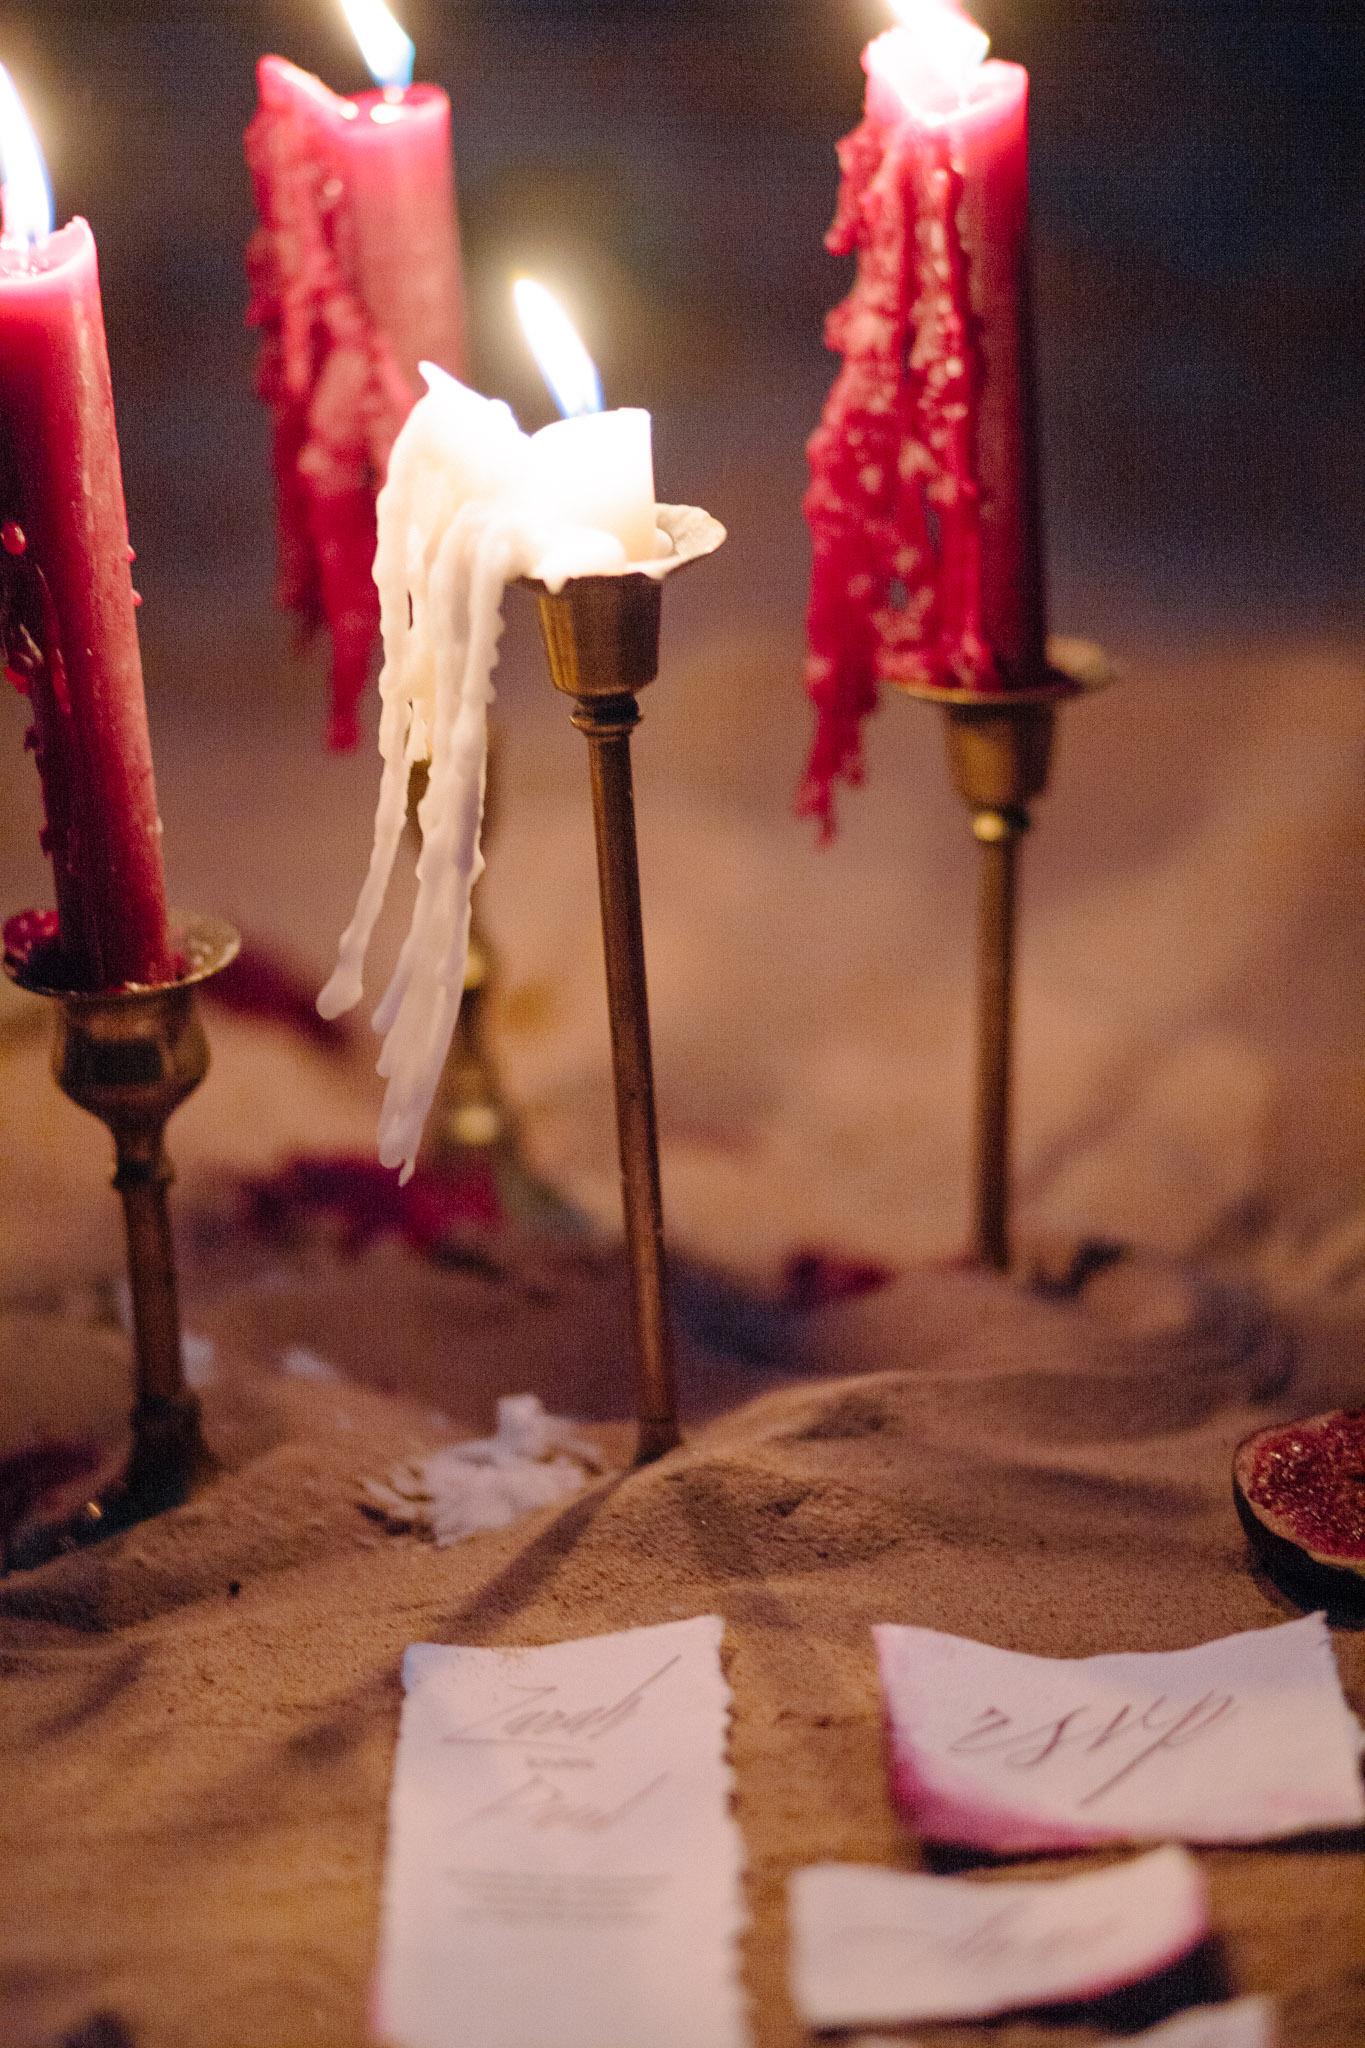 Speyer-Moroccan-Wedding-Inspiration-Pia-Anna-Christian-Wedding-Photography-S-108.jpg